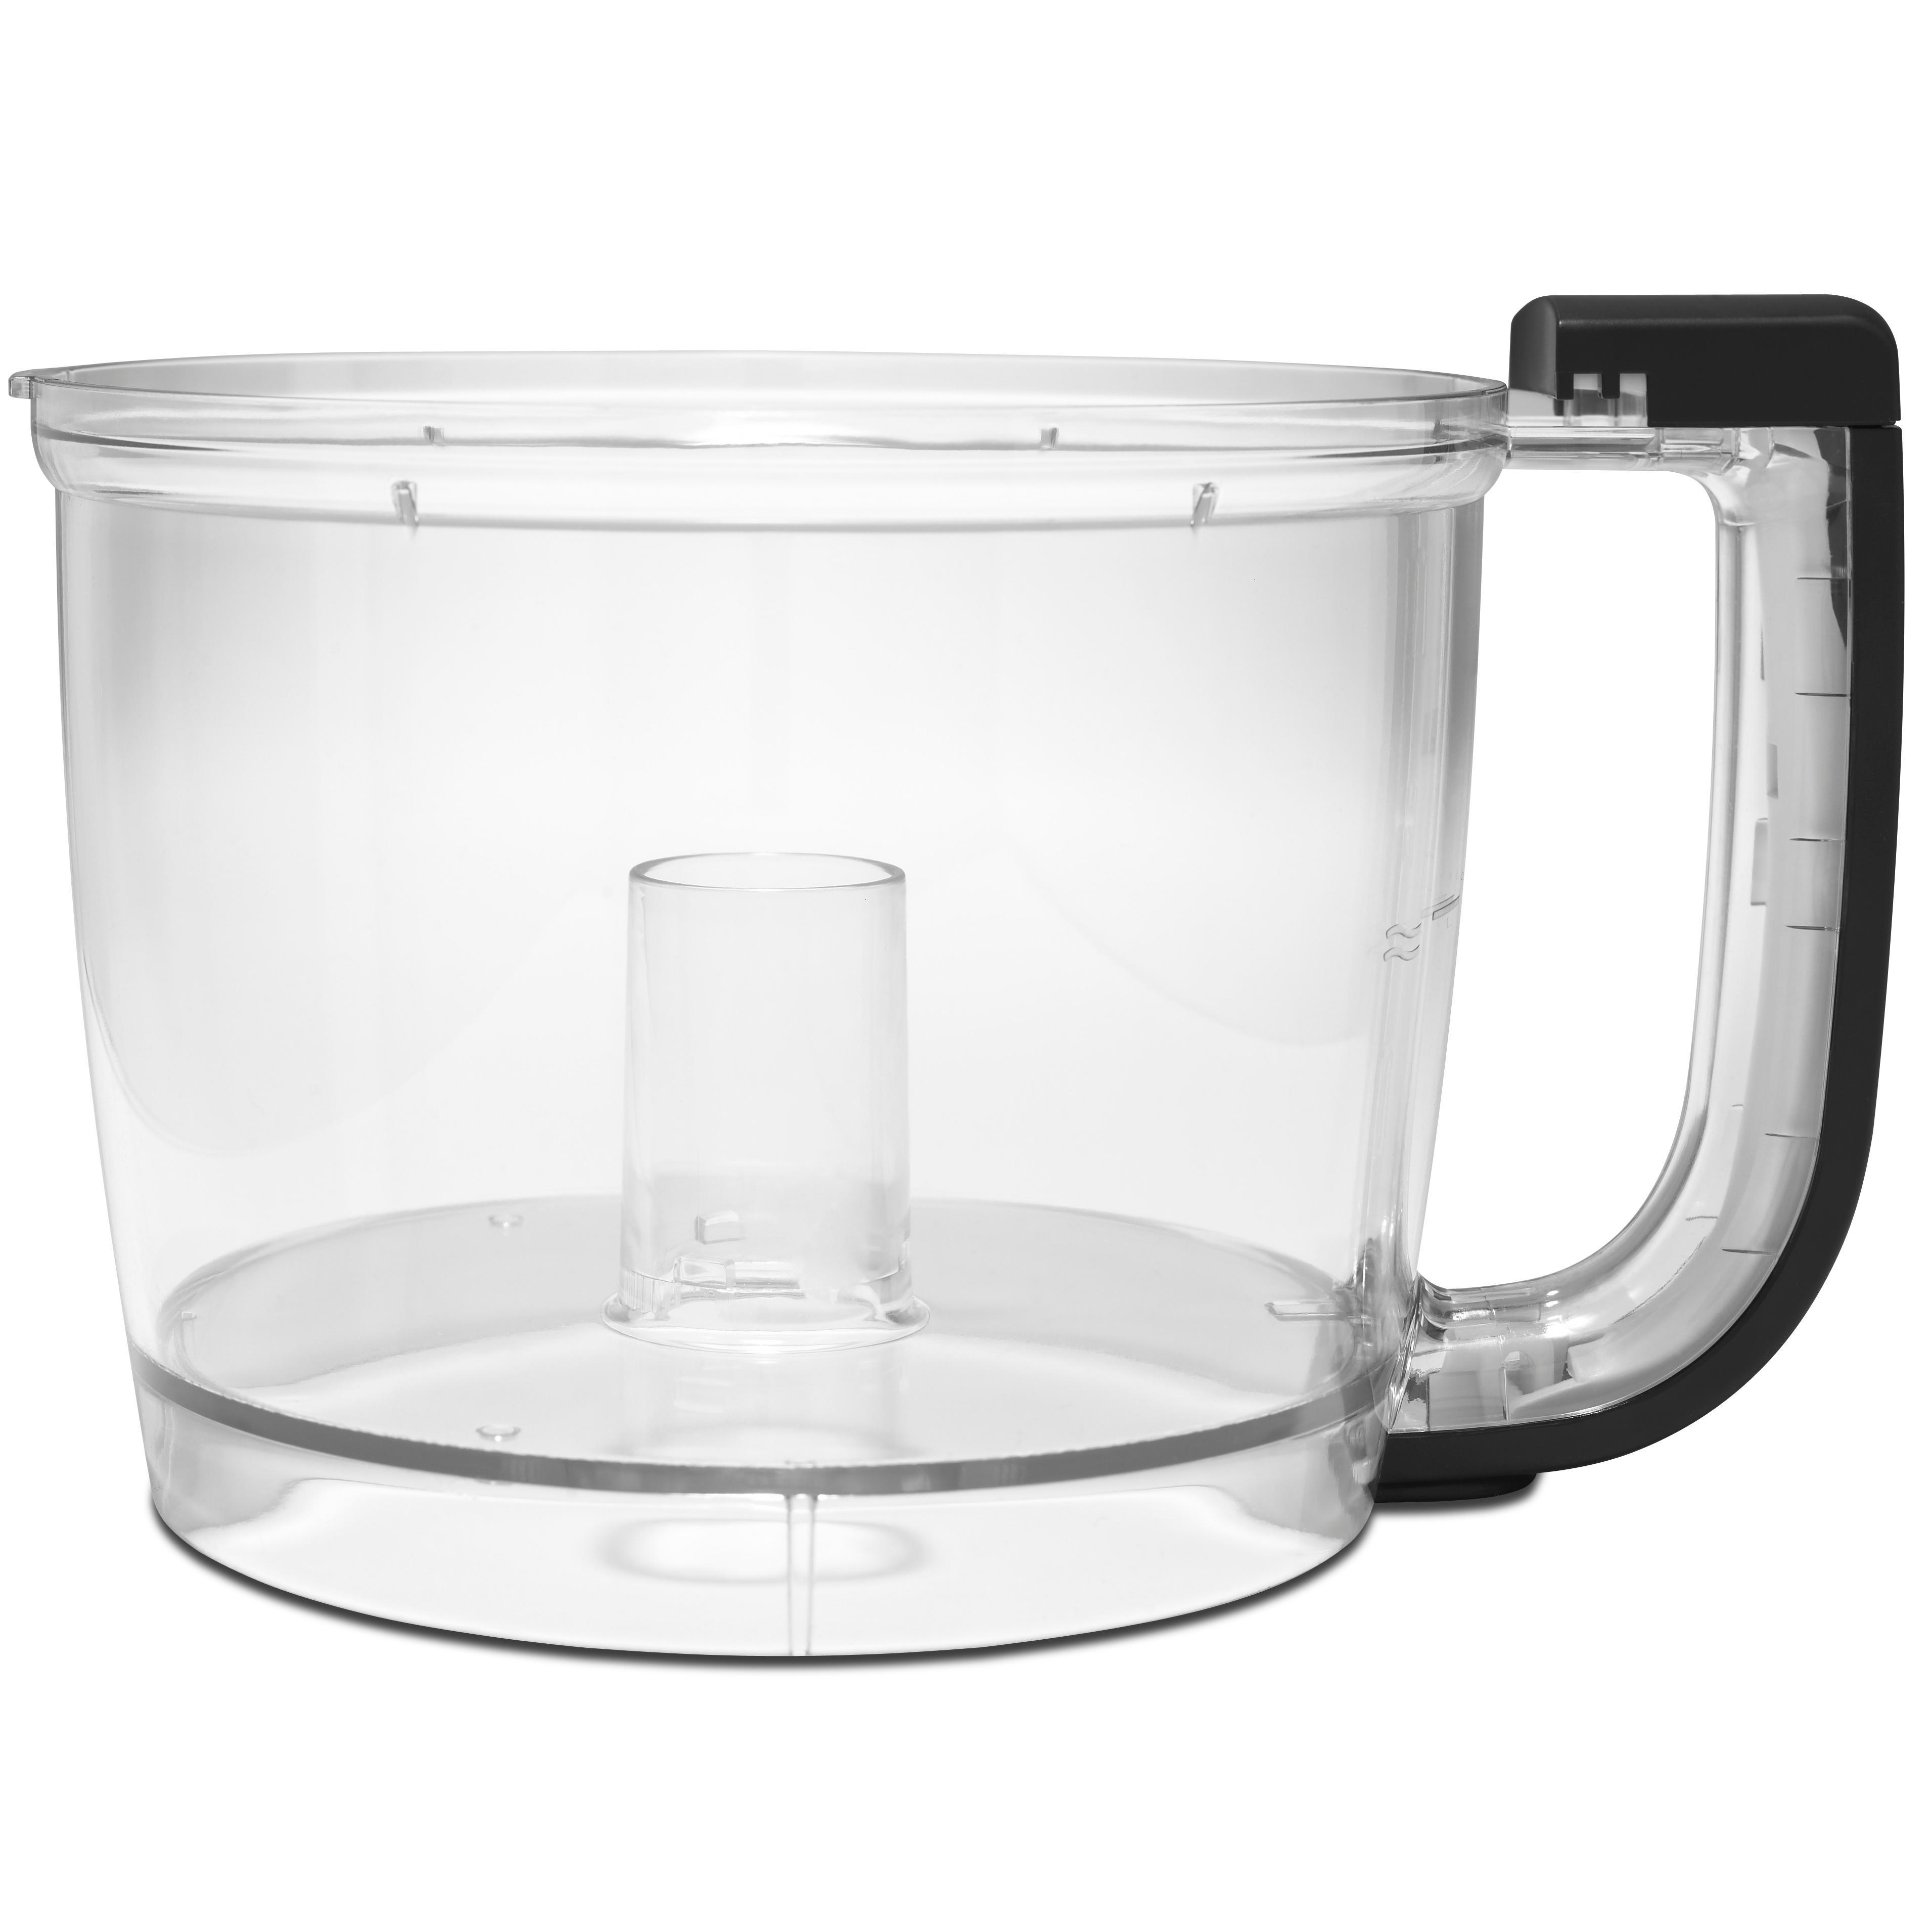 Kitchenaid food processor reviews 7 cup - View Larger